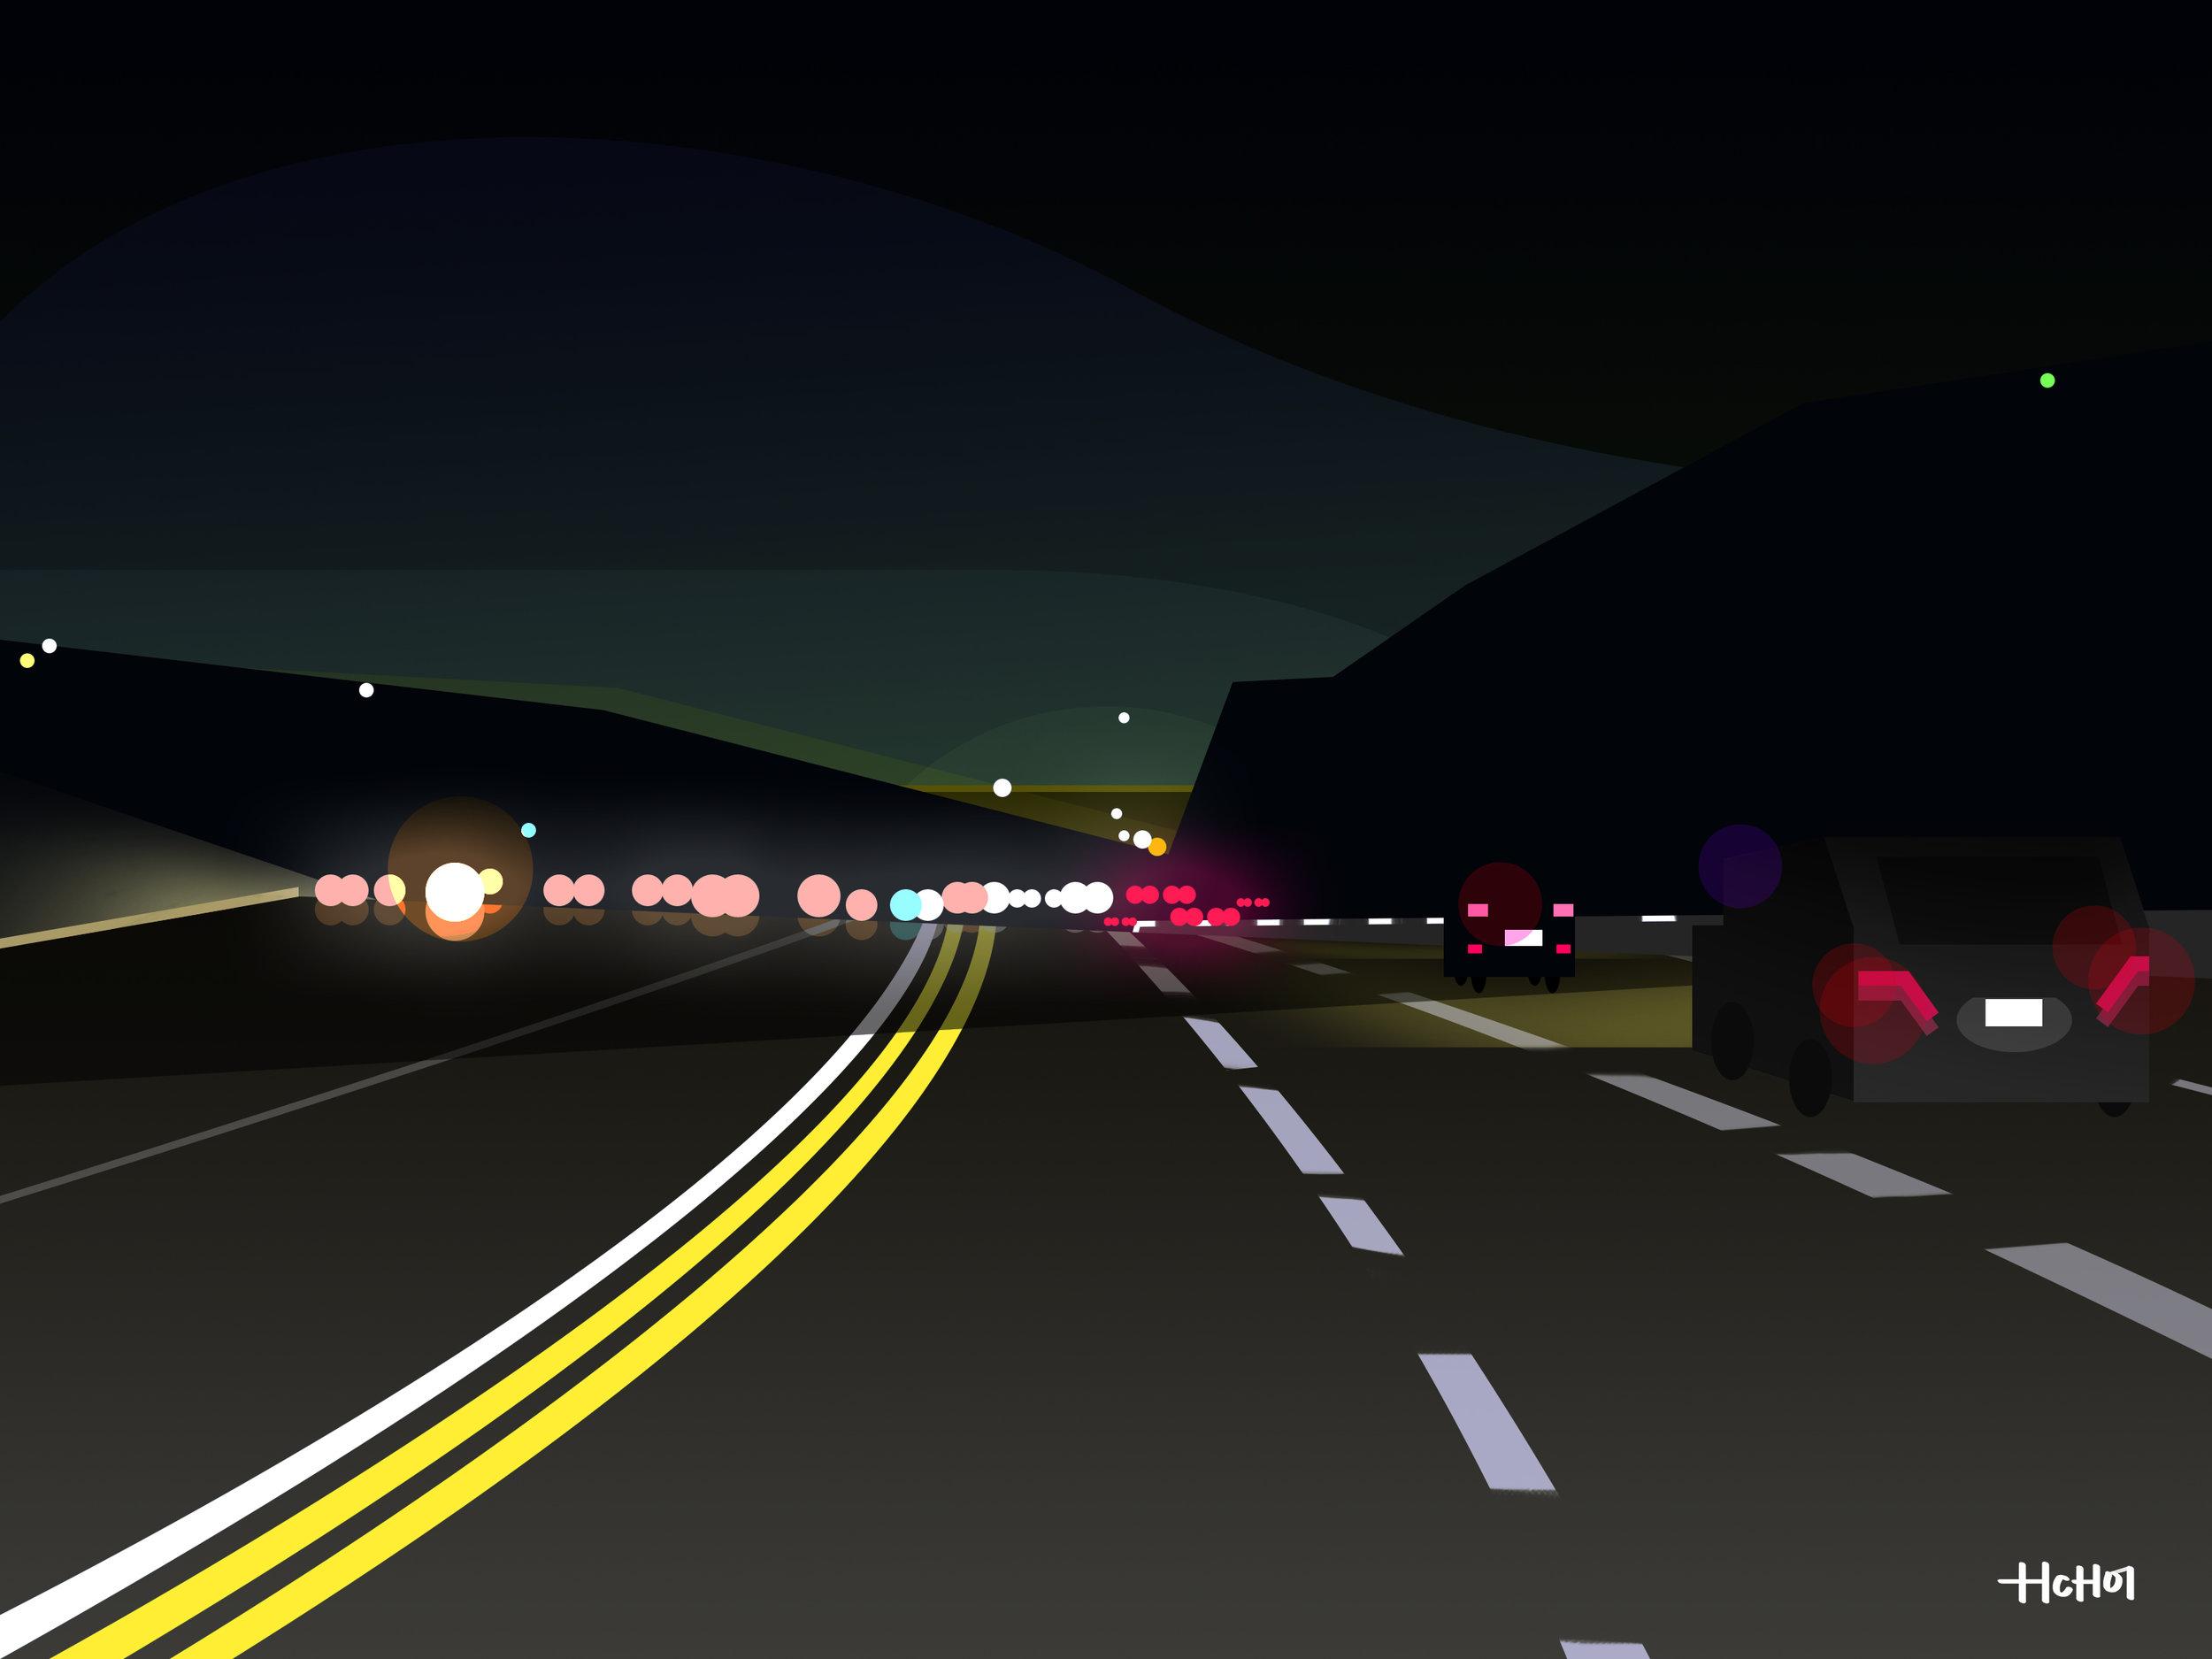 405 freeway by mulholland drive. LA